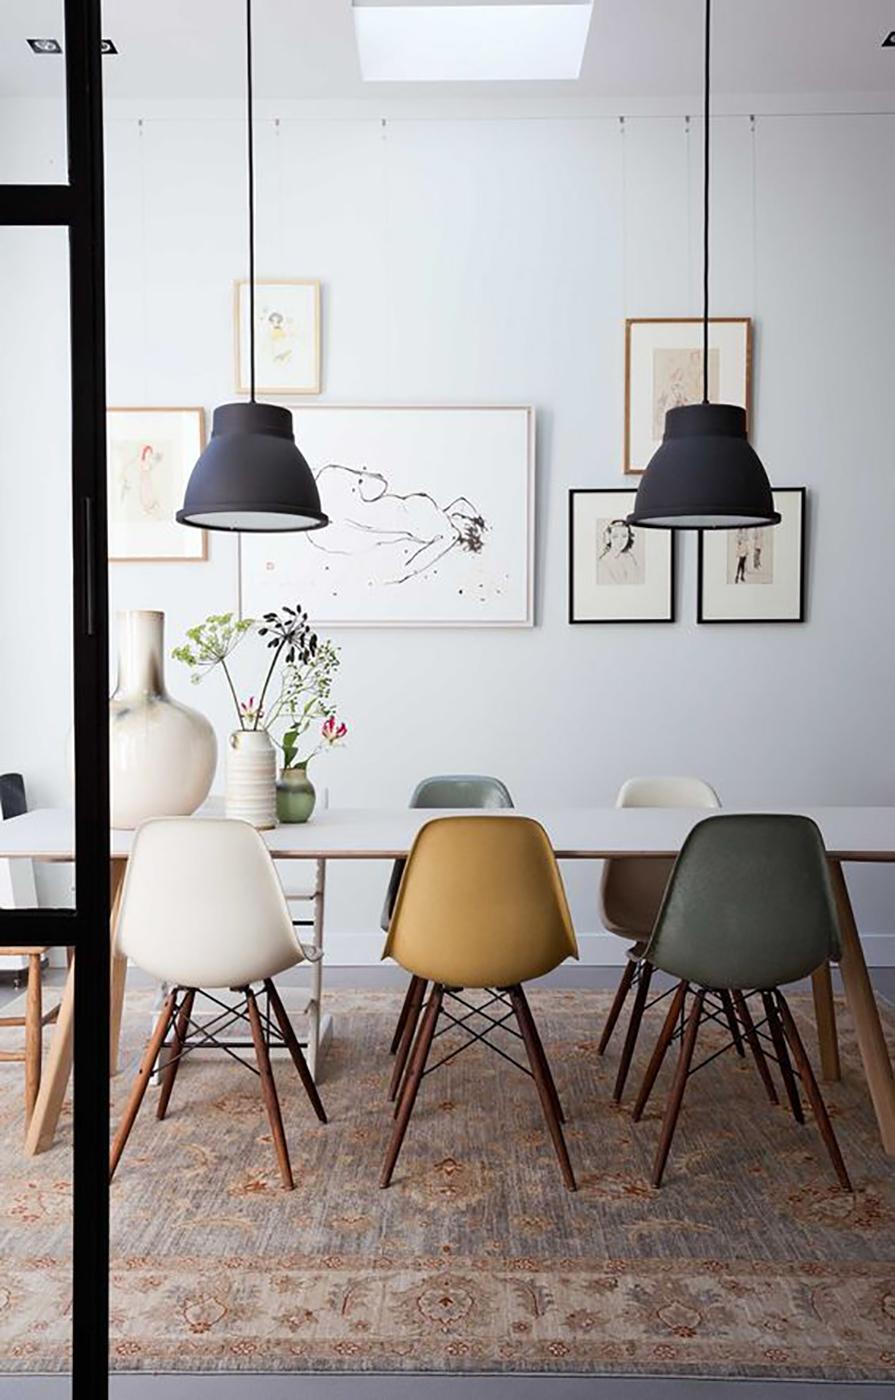 cadeira-design-classica-eames-eiffel-decoracao-dani-noce-1